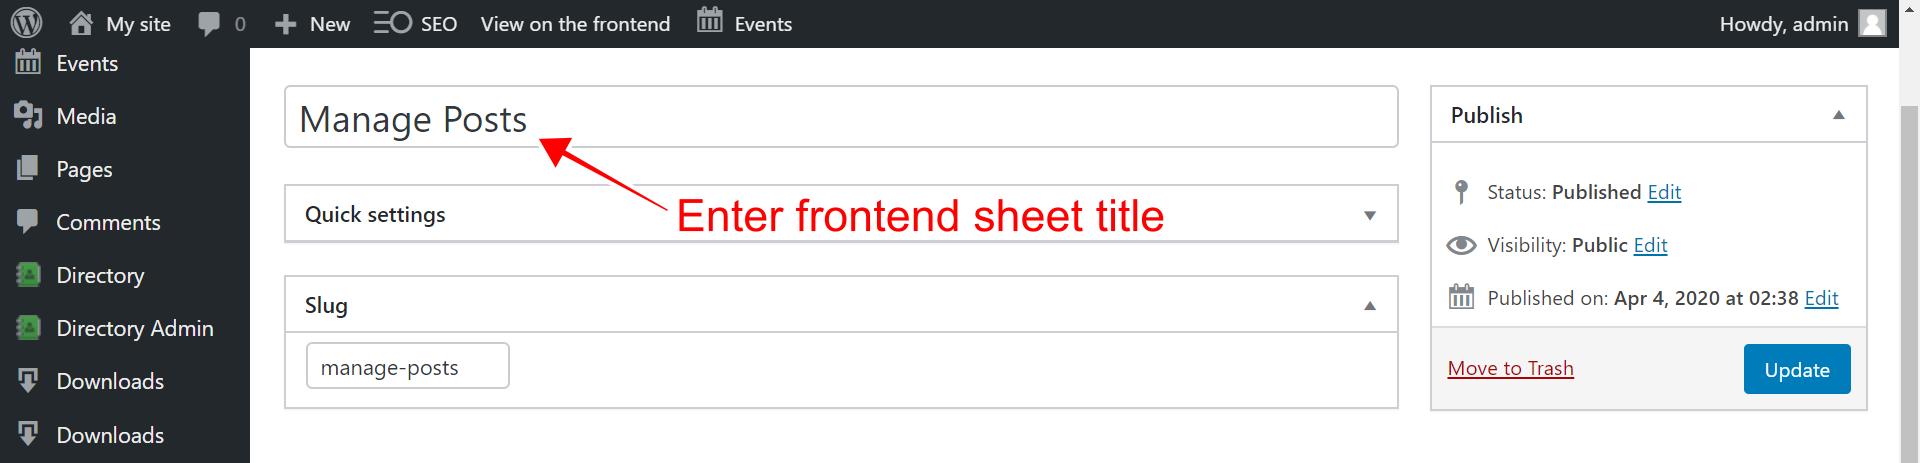 WordPress –如何为前端创建可编辑的帖子表